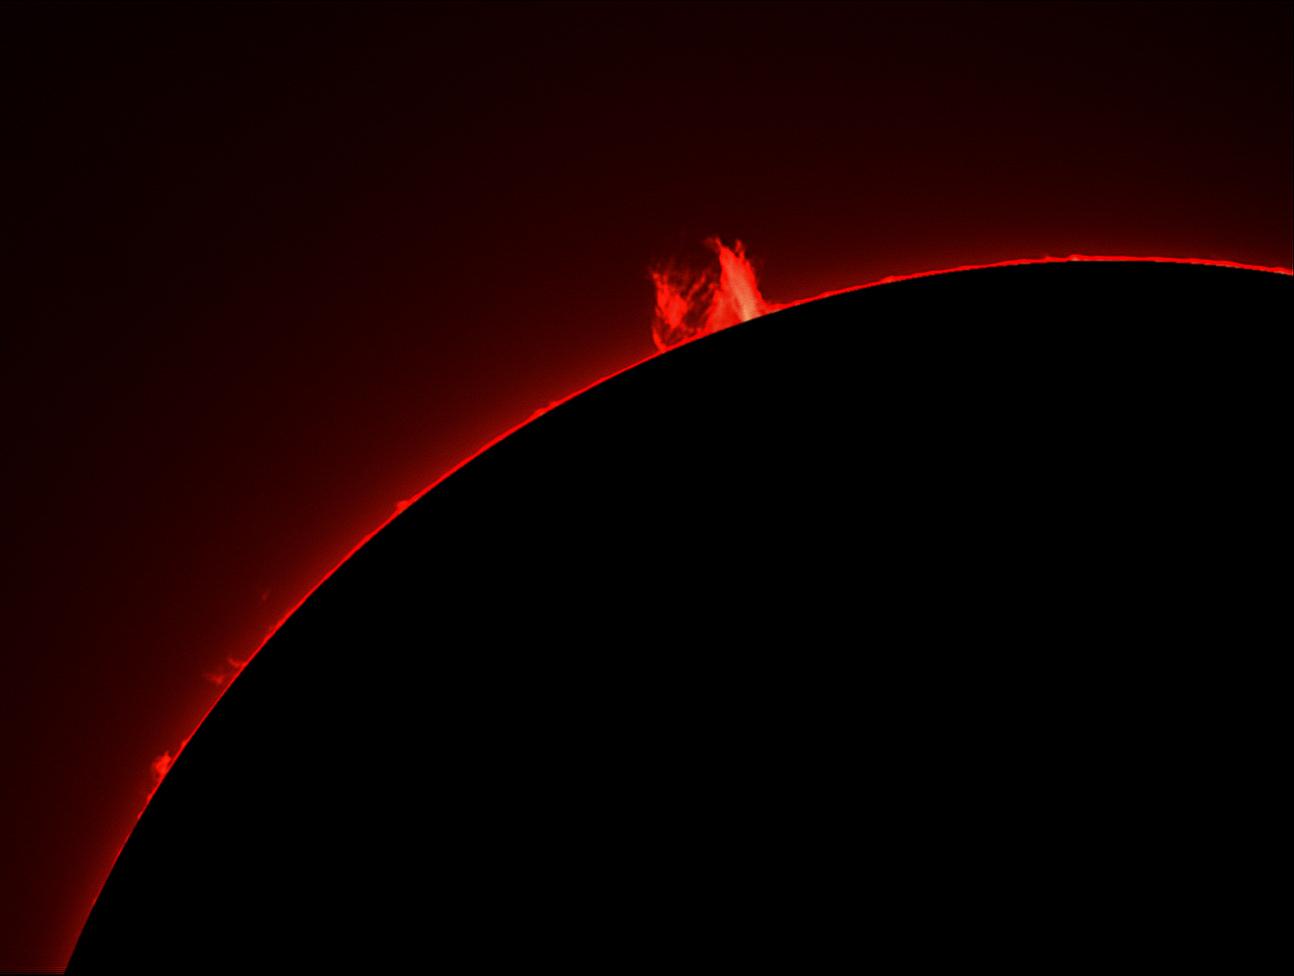 sol5_10_01_21.jpg.15355fb47305ed1d54f4e833bcedc0ba.jpg